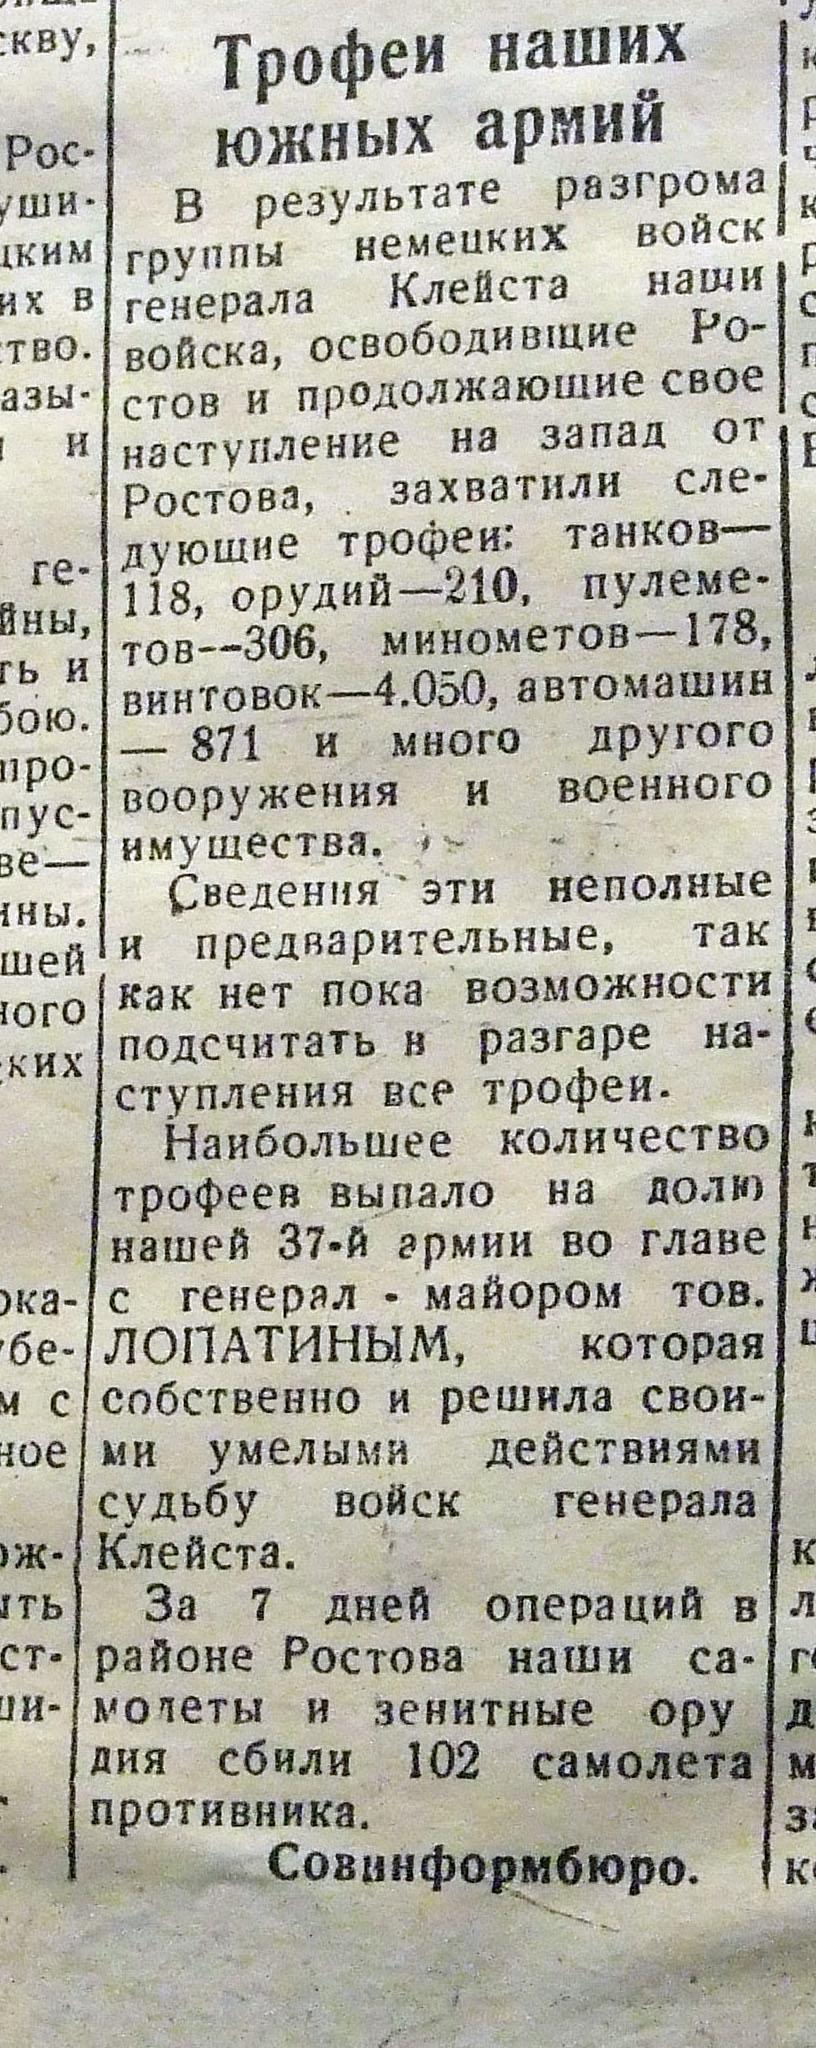 http://s1.uploads.ru/3YHMO.jpg